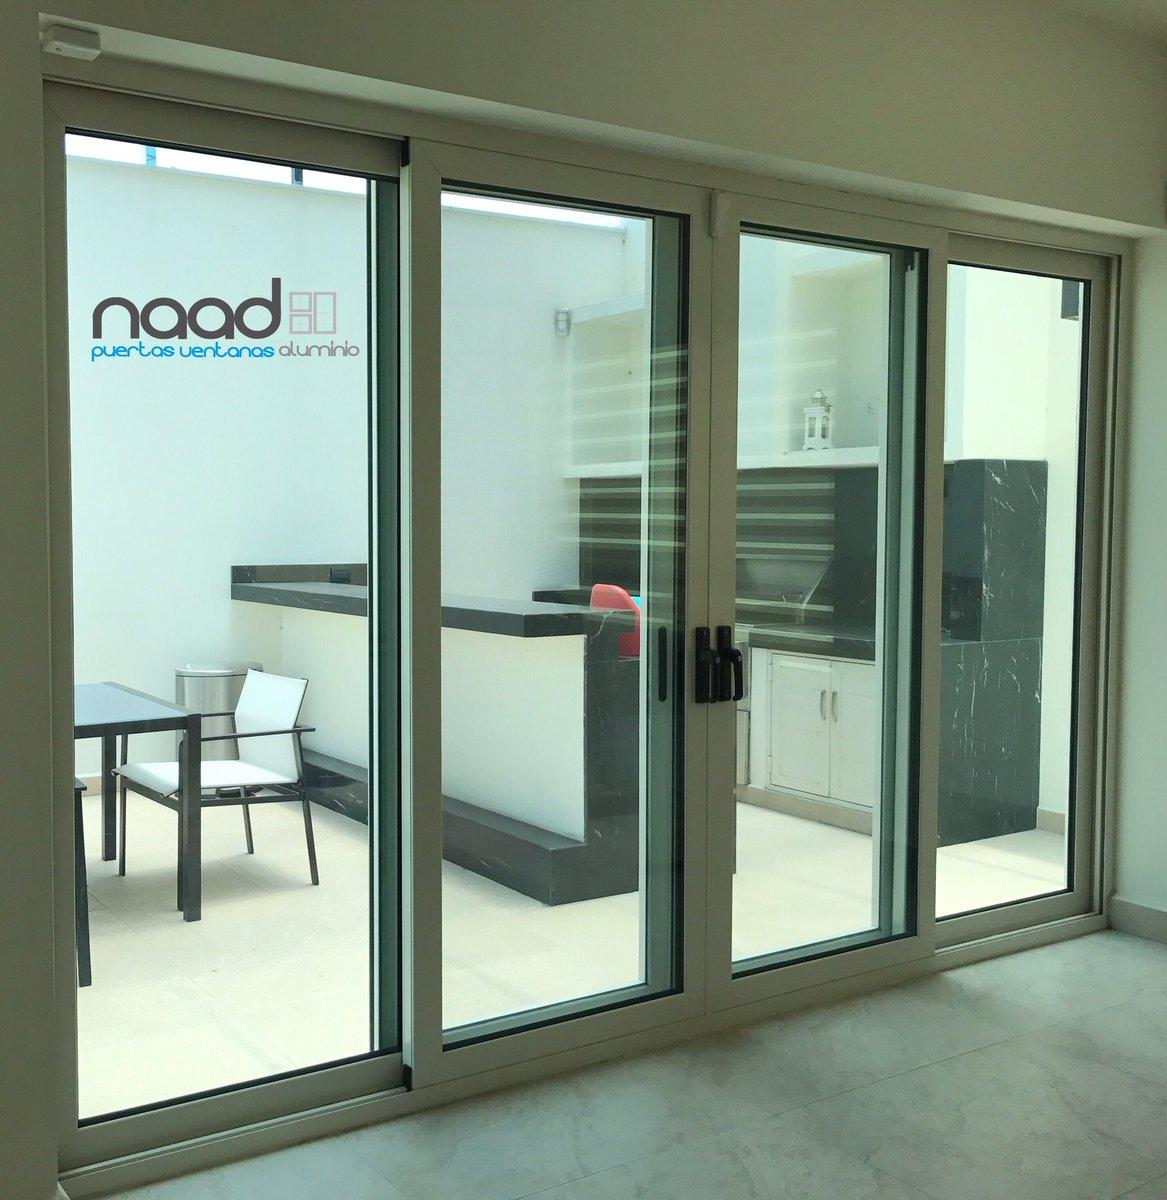 Naad aluminio on twitter puerta corrediza de aluminio for Puertas corredizas de aluminio